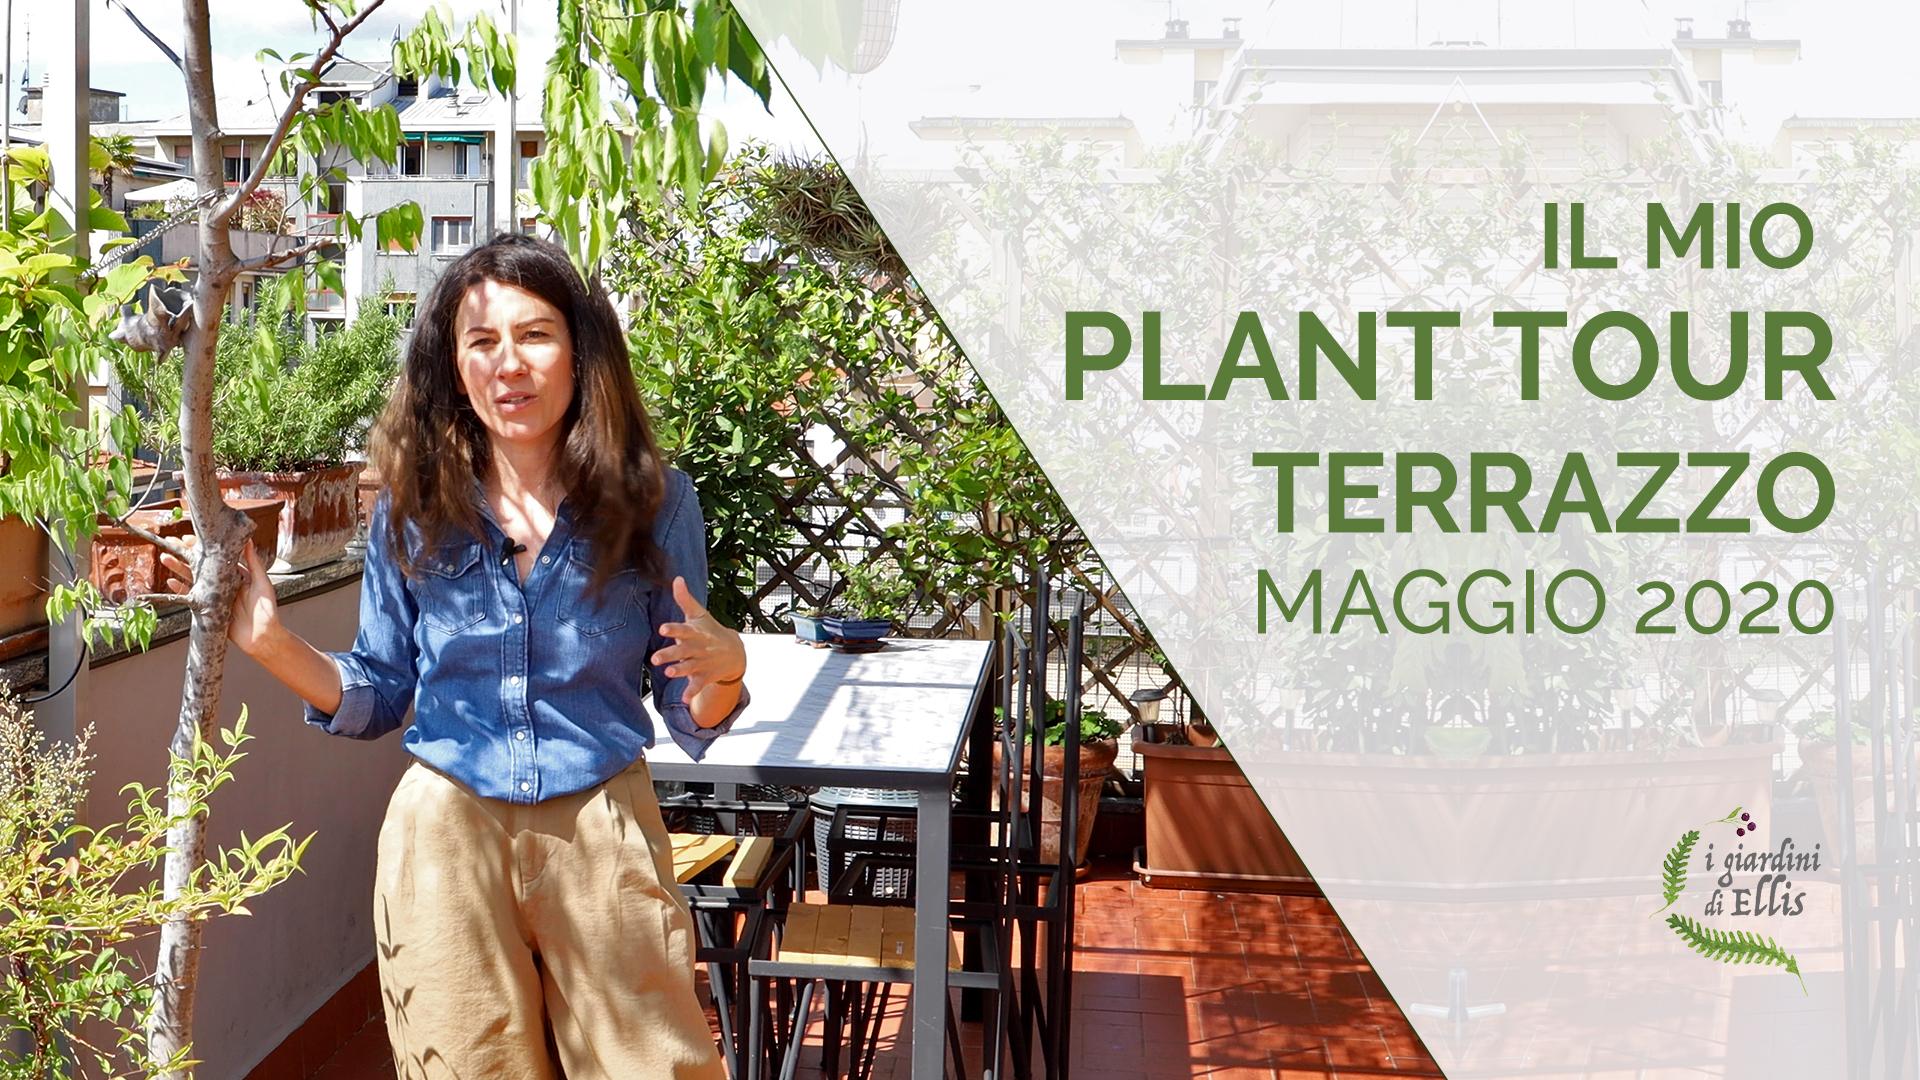 Plant Tour - I Giardini di Ellis